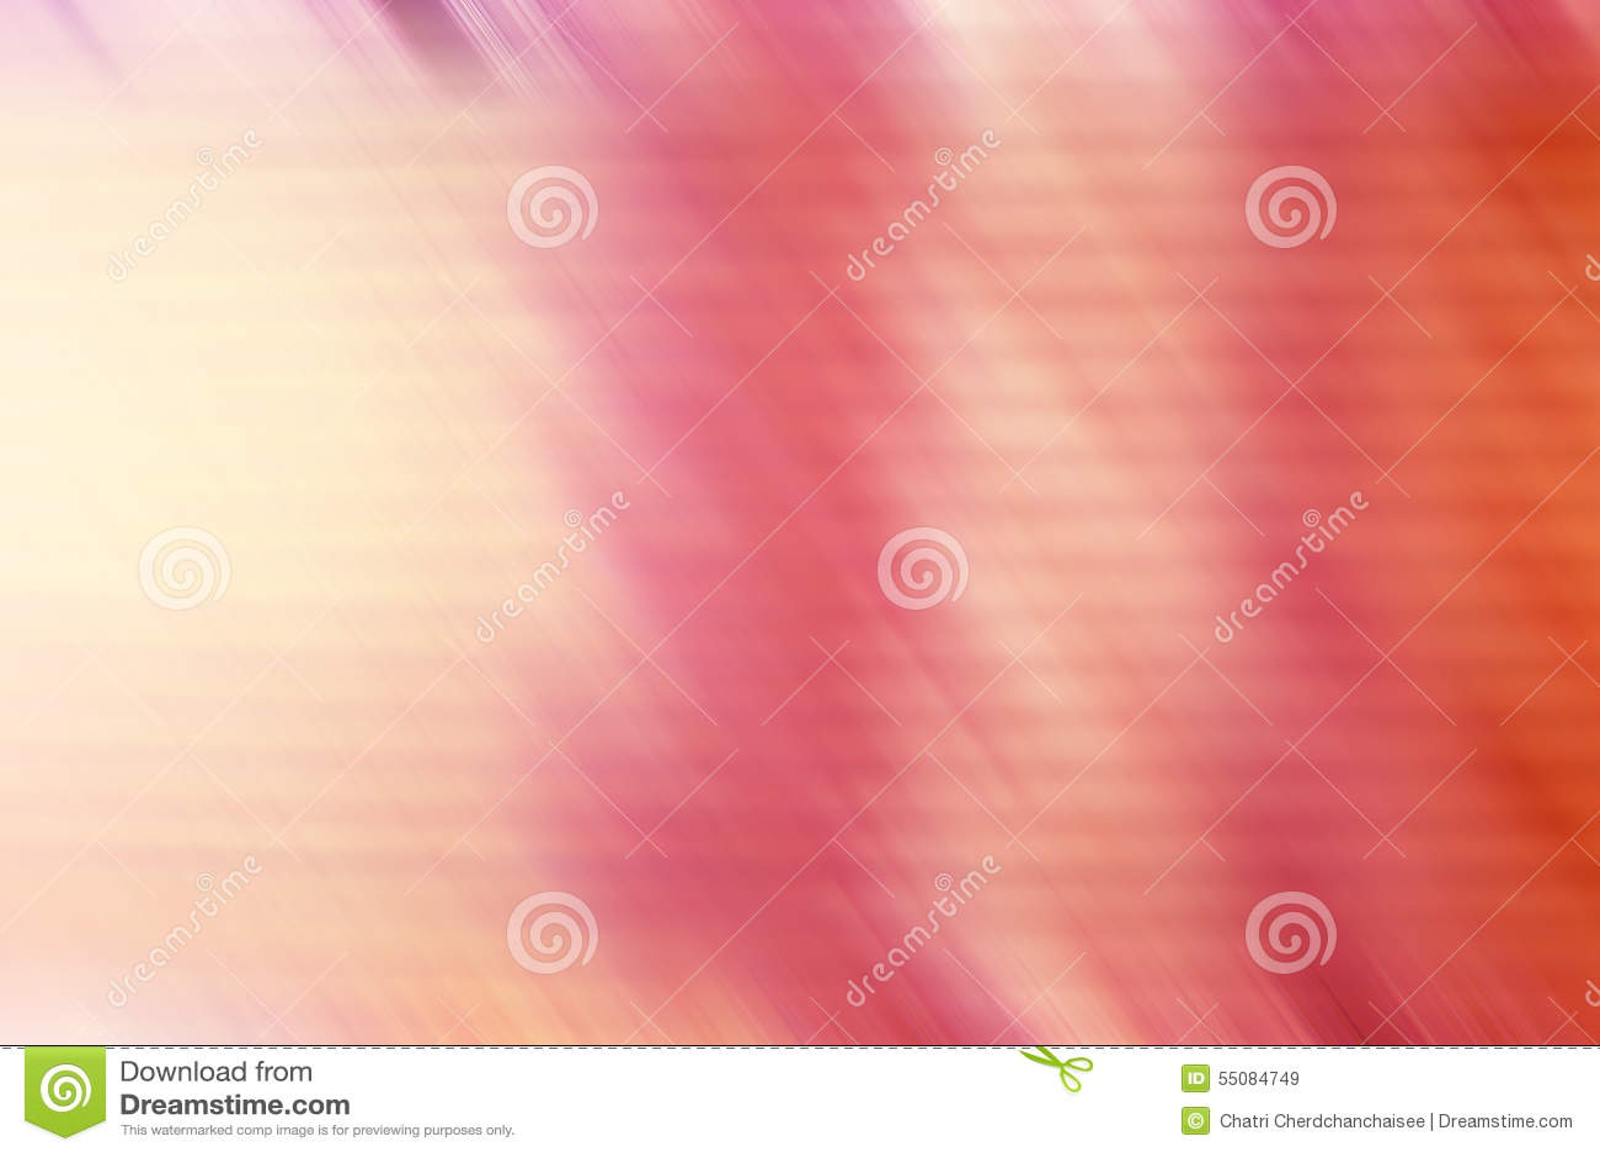 Abstracte rood lichtachtergrond